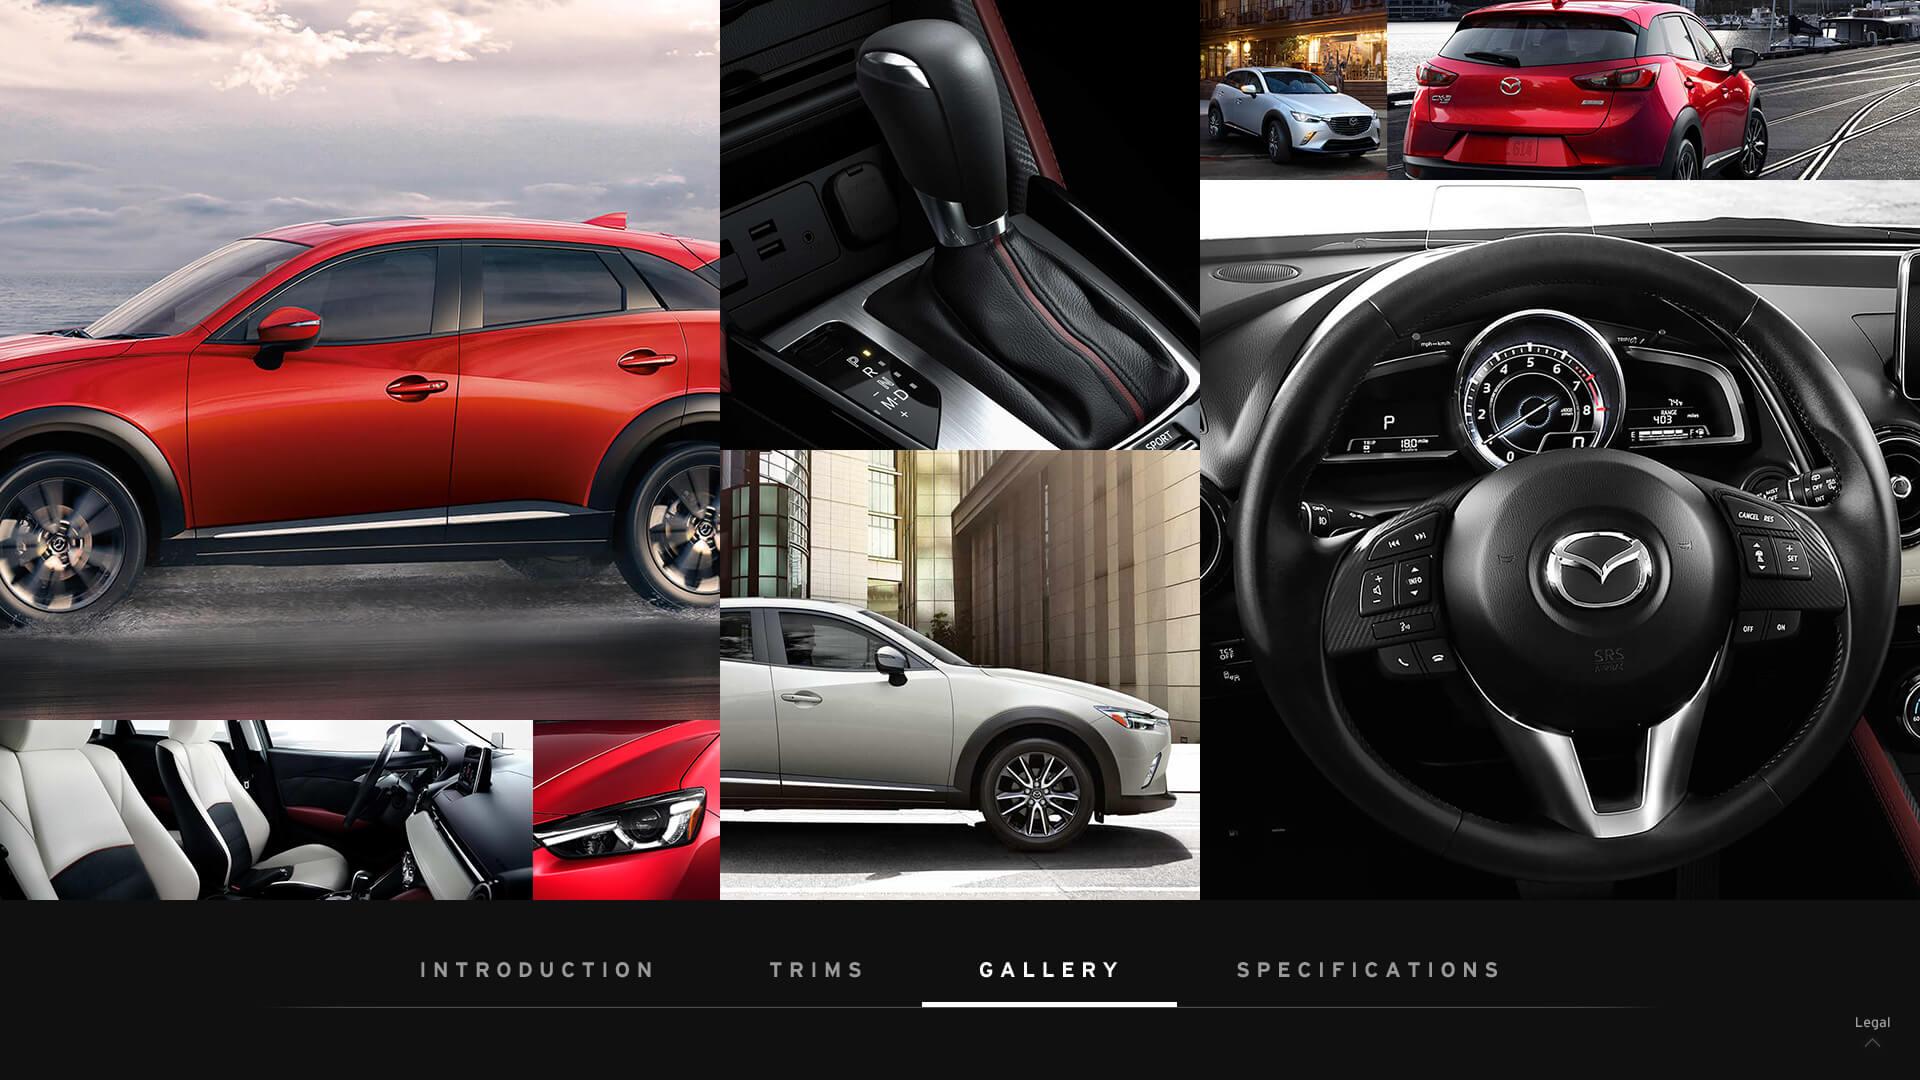 Mazda_wheelstand_2017_gallery